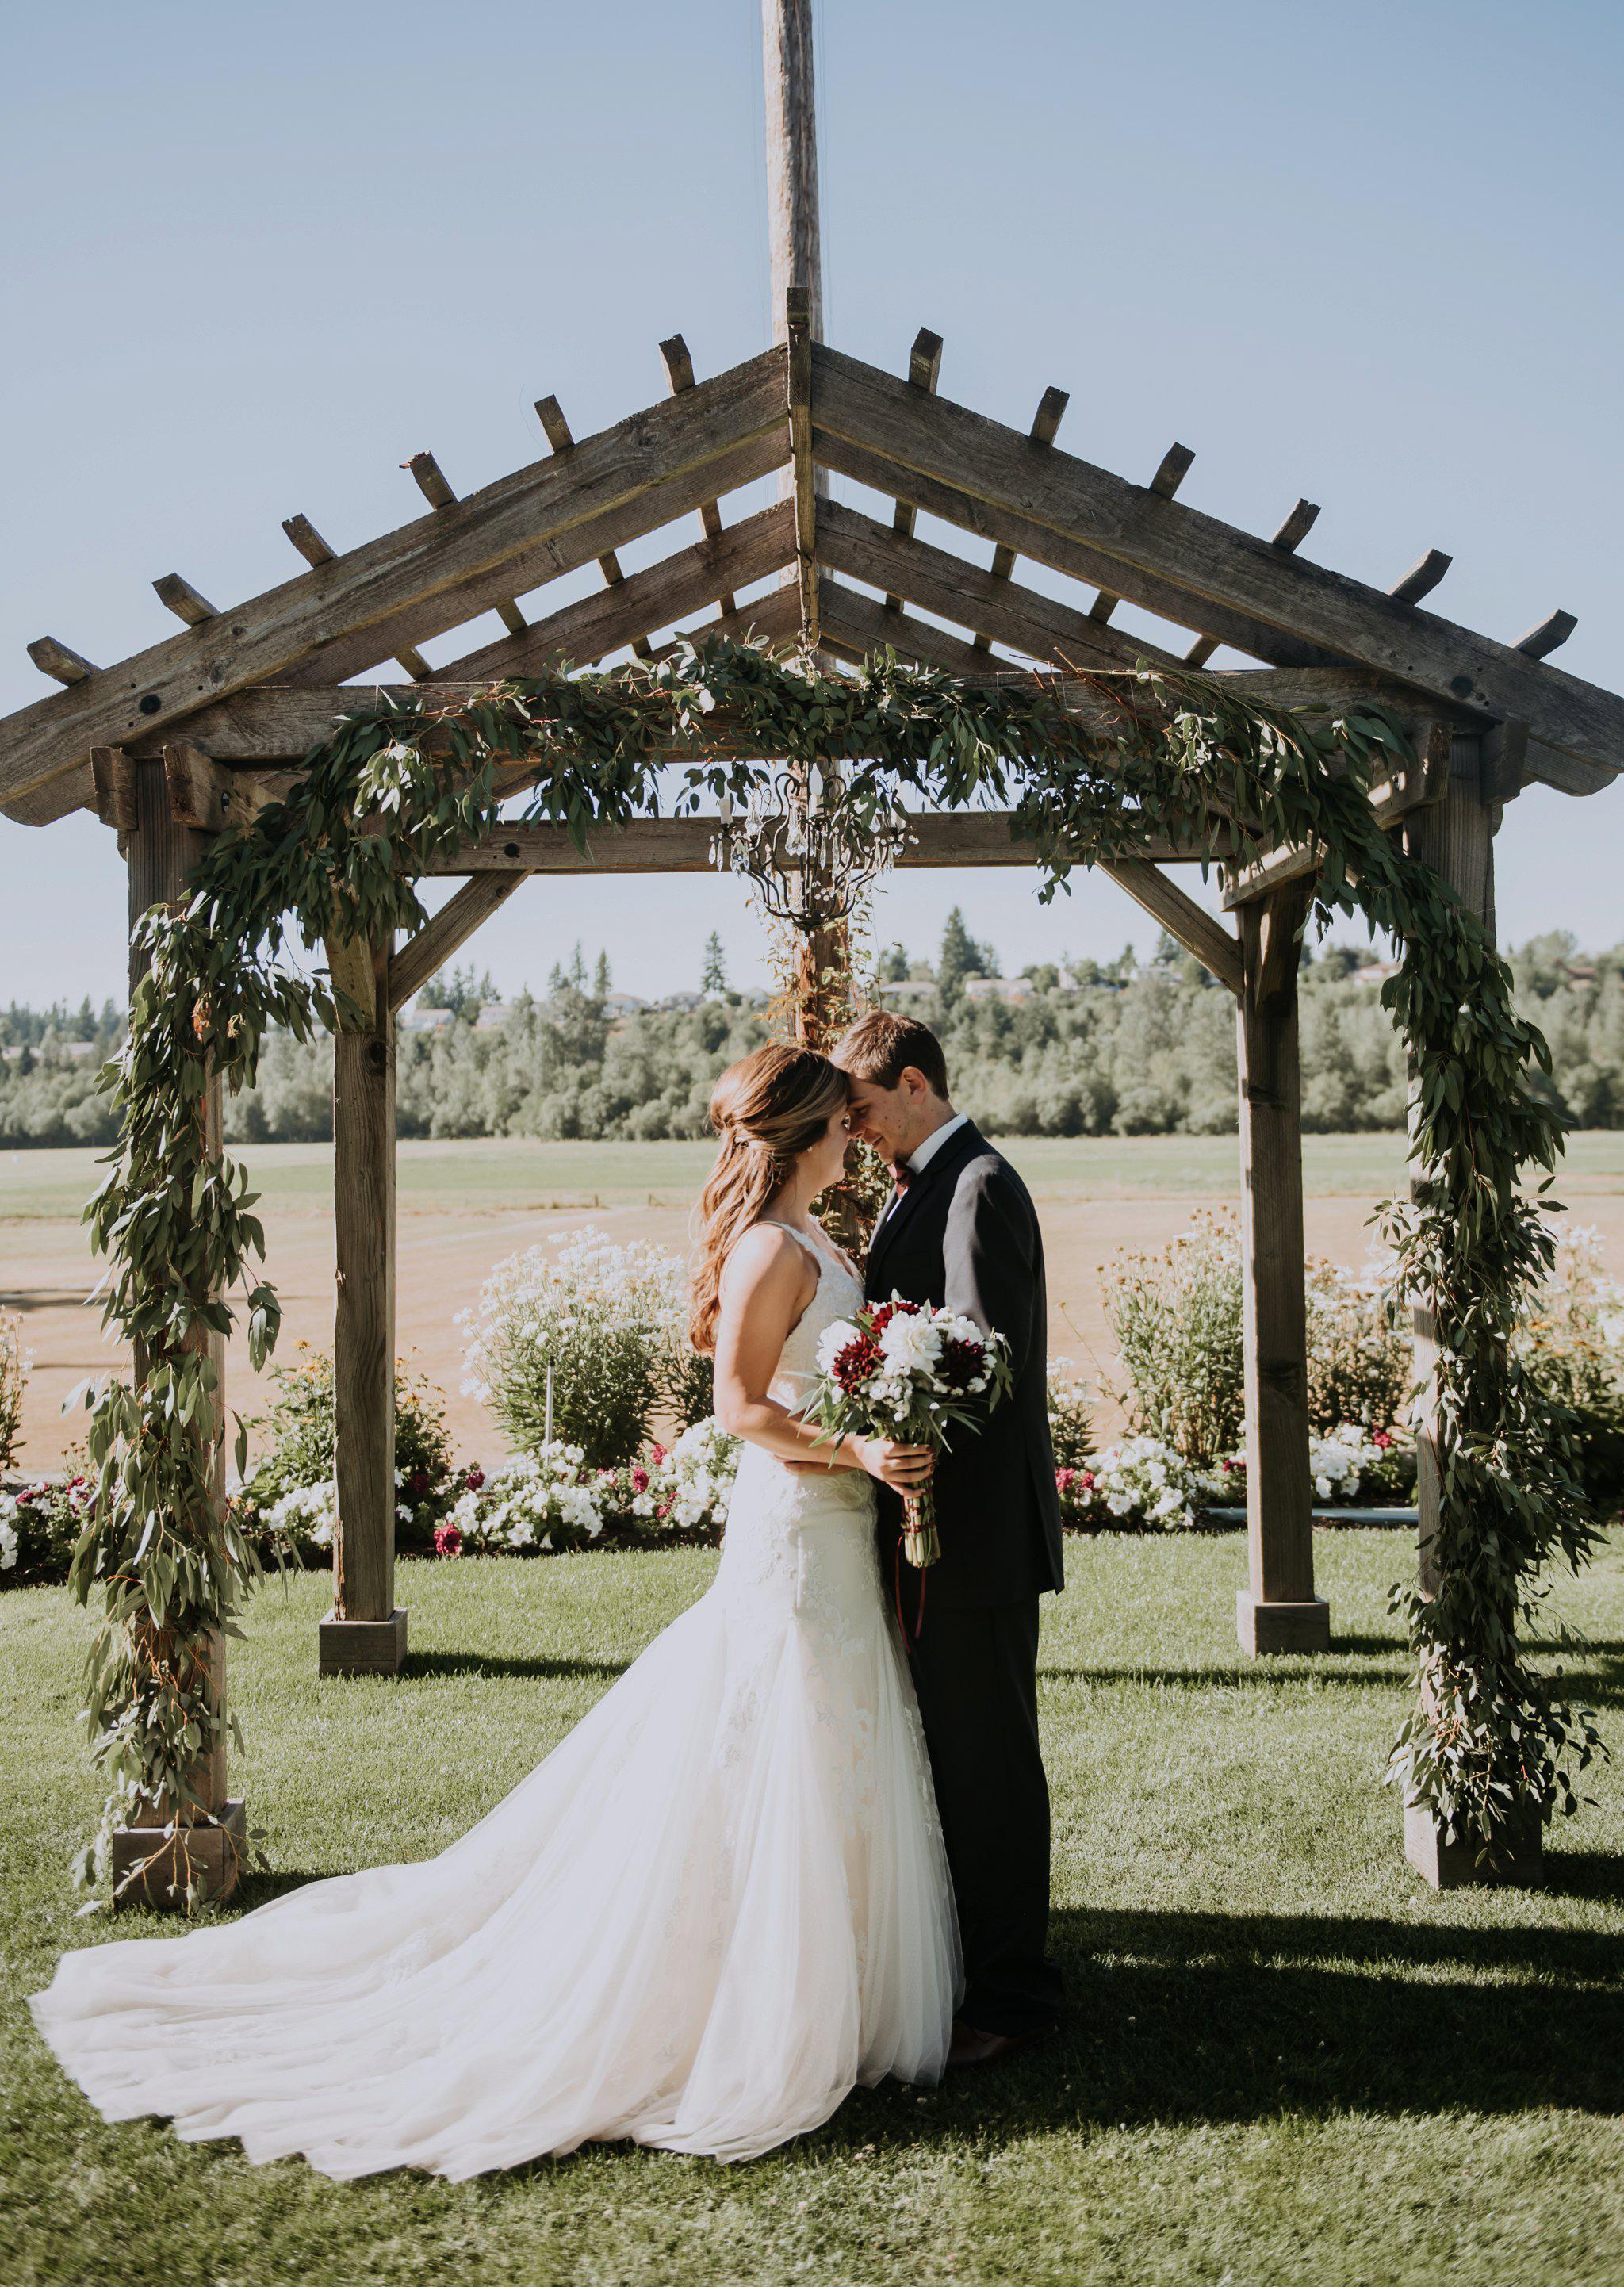 kristen-and-cody-the-kelley-farm-wedding-seattle-photographer-caitlyn-nikula-65.jpg